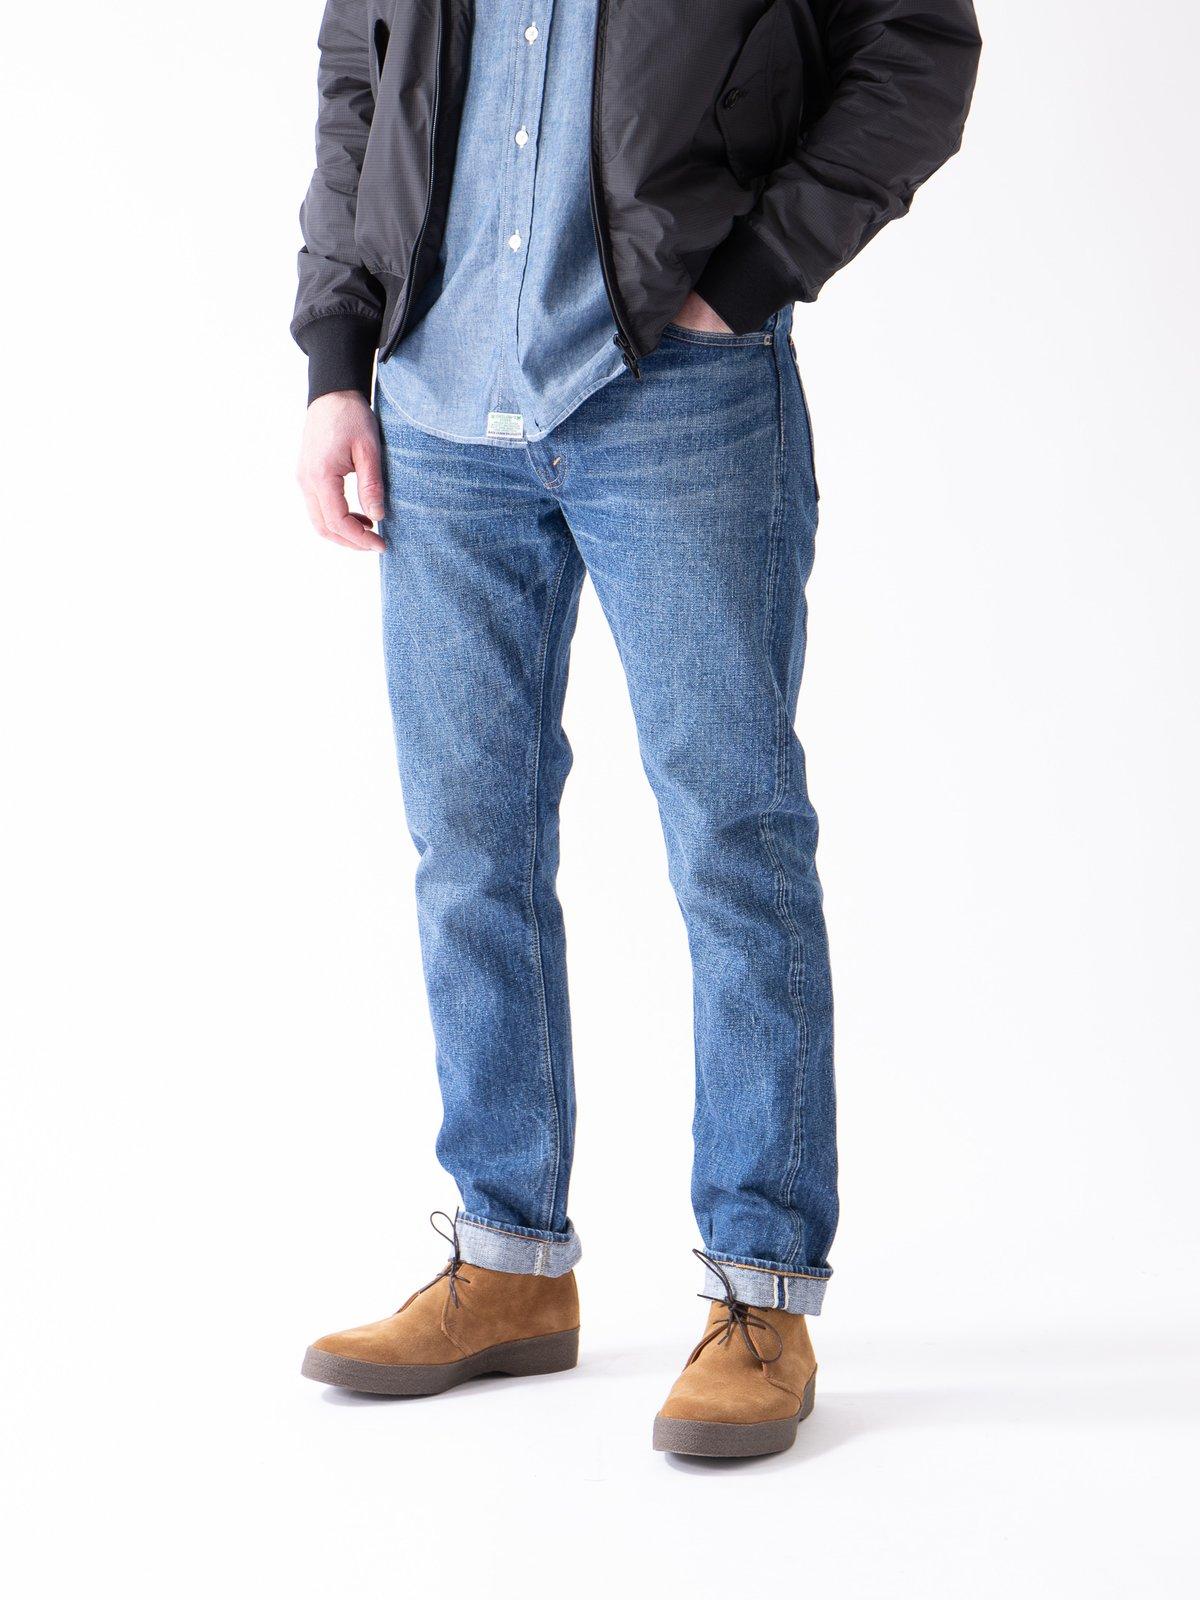 2 Year Wash 107 Slim Fit Jean - Image 2